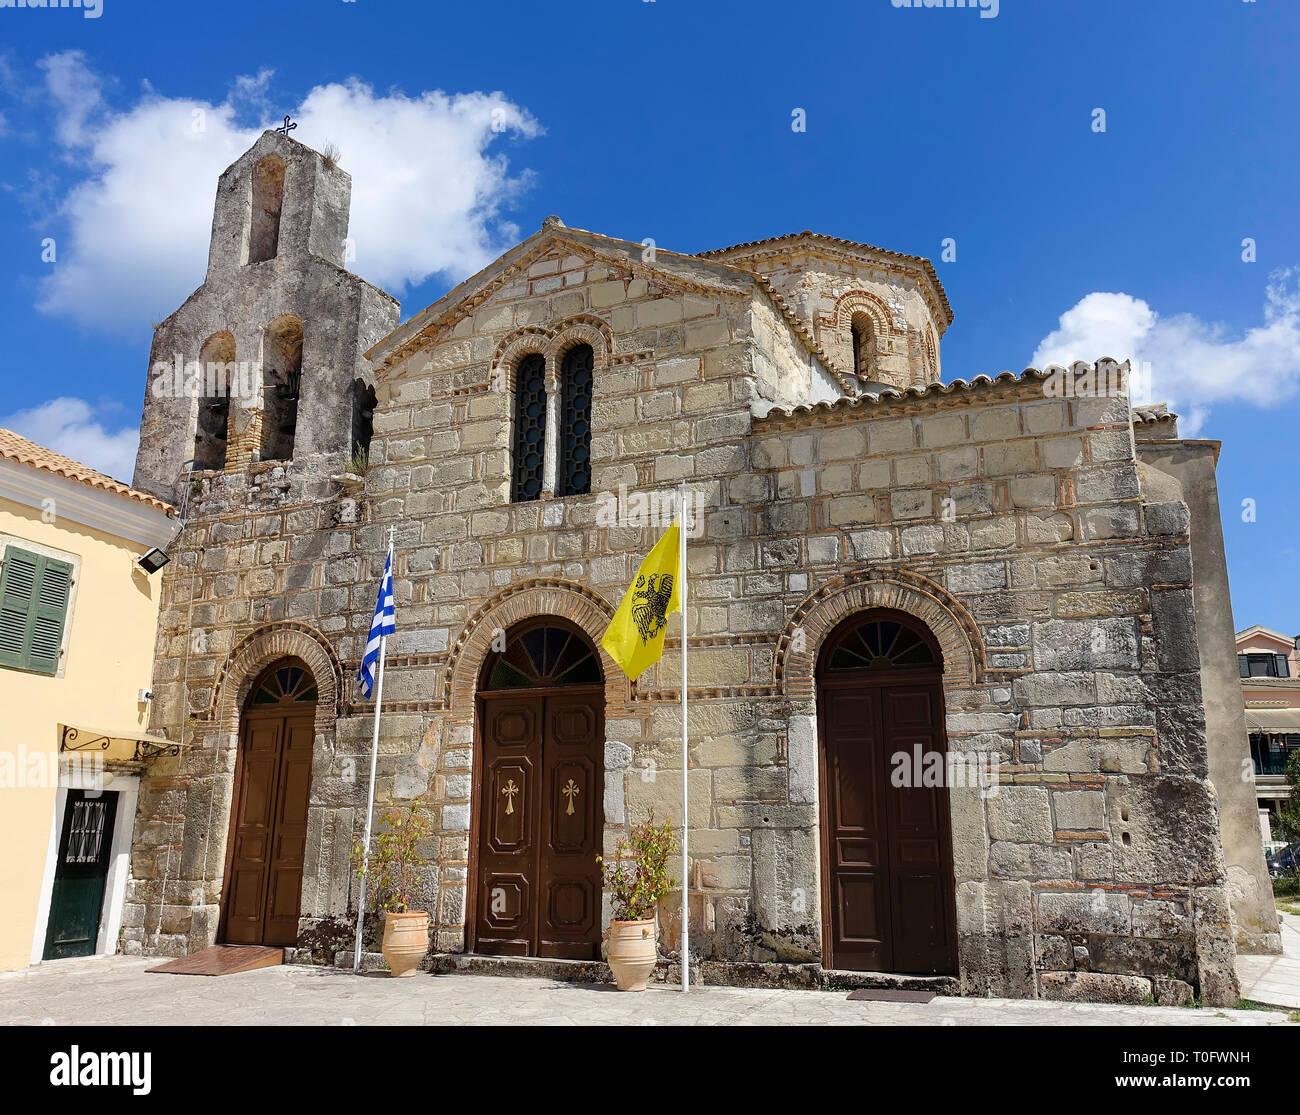 The Church of Saint Jason and Sosipater, oldest church in Corfu, Greece - Stock Image